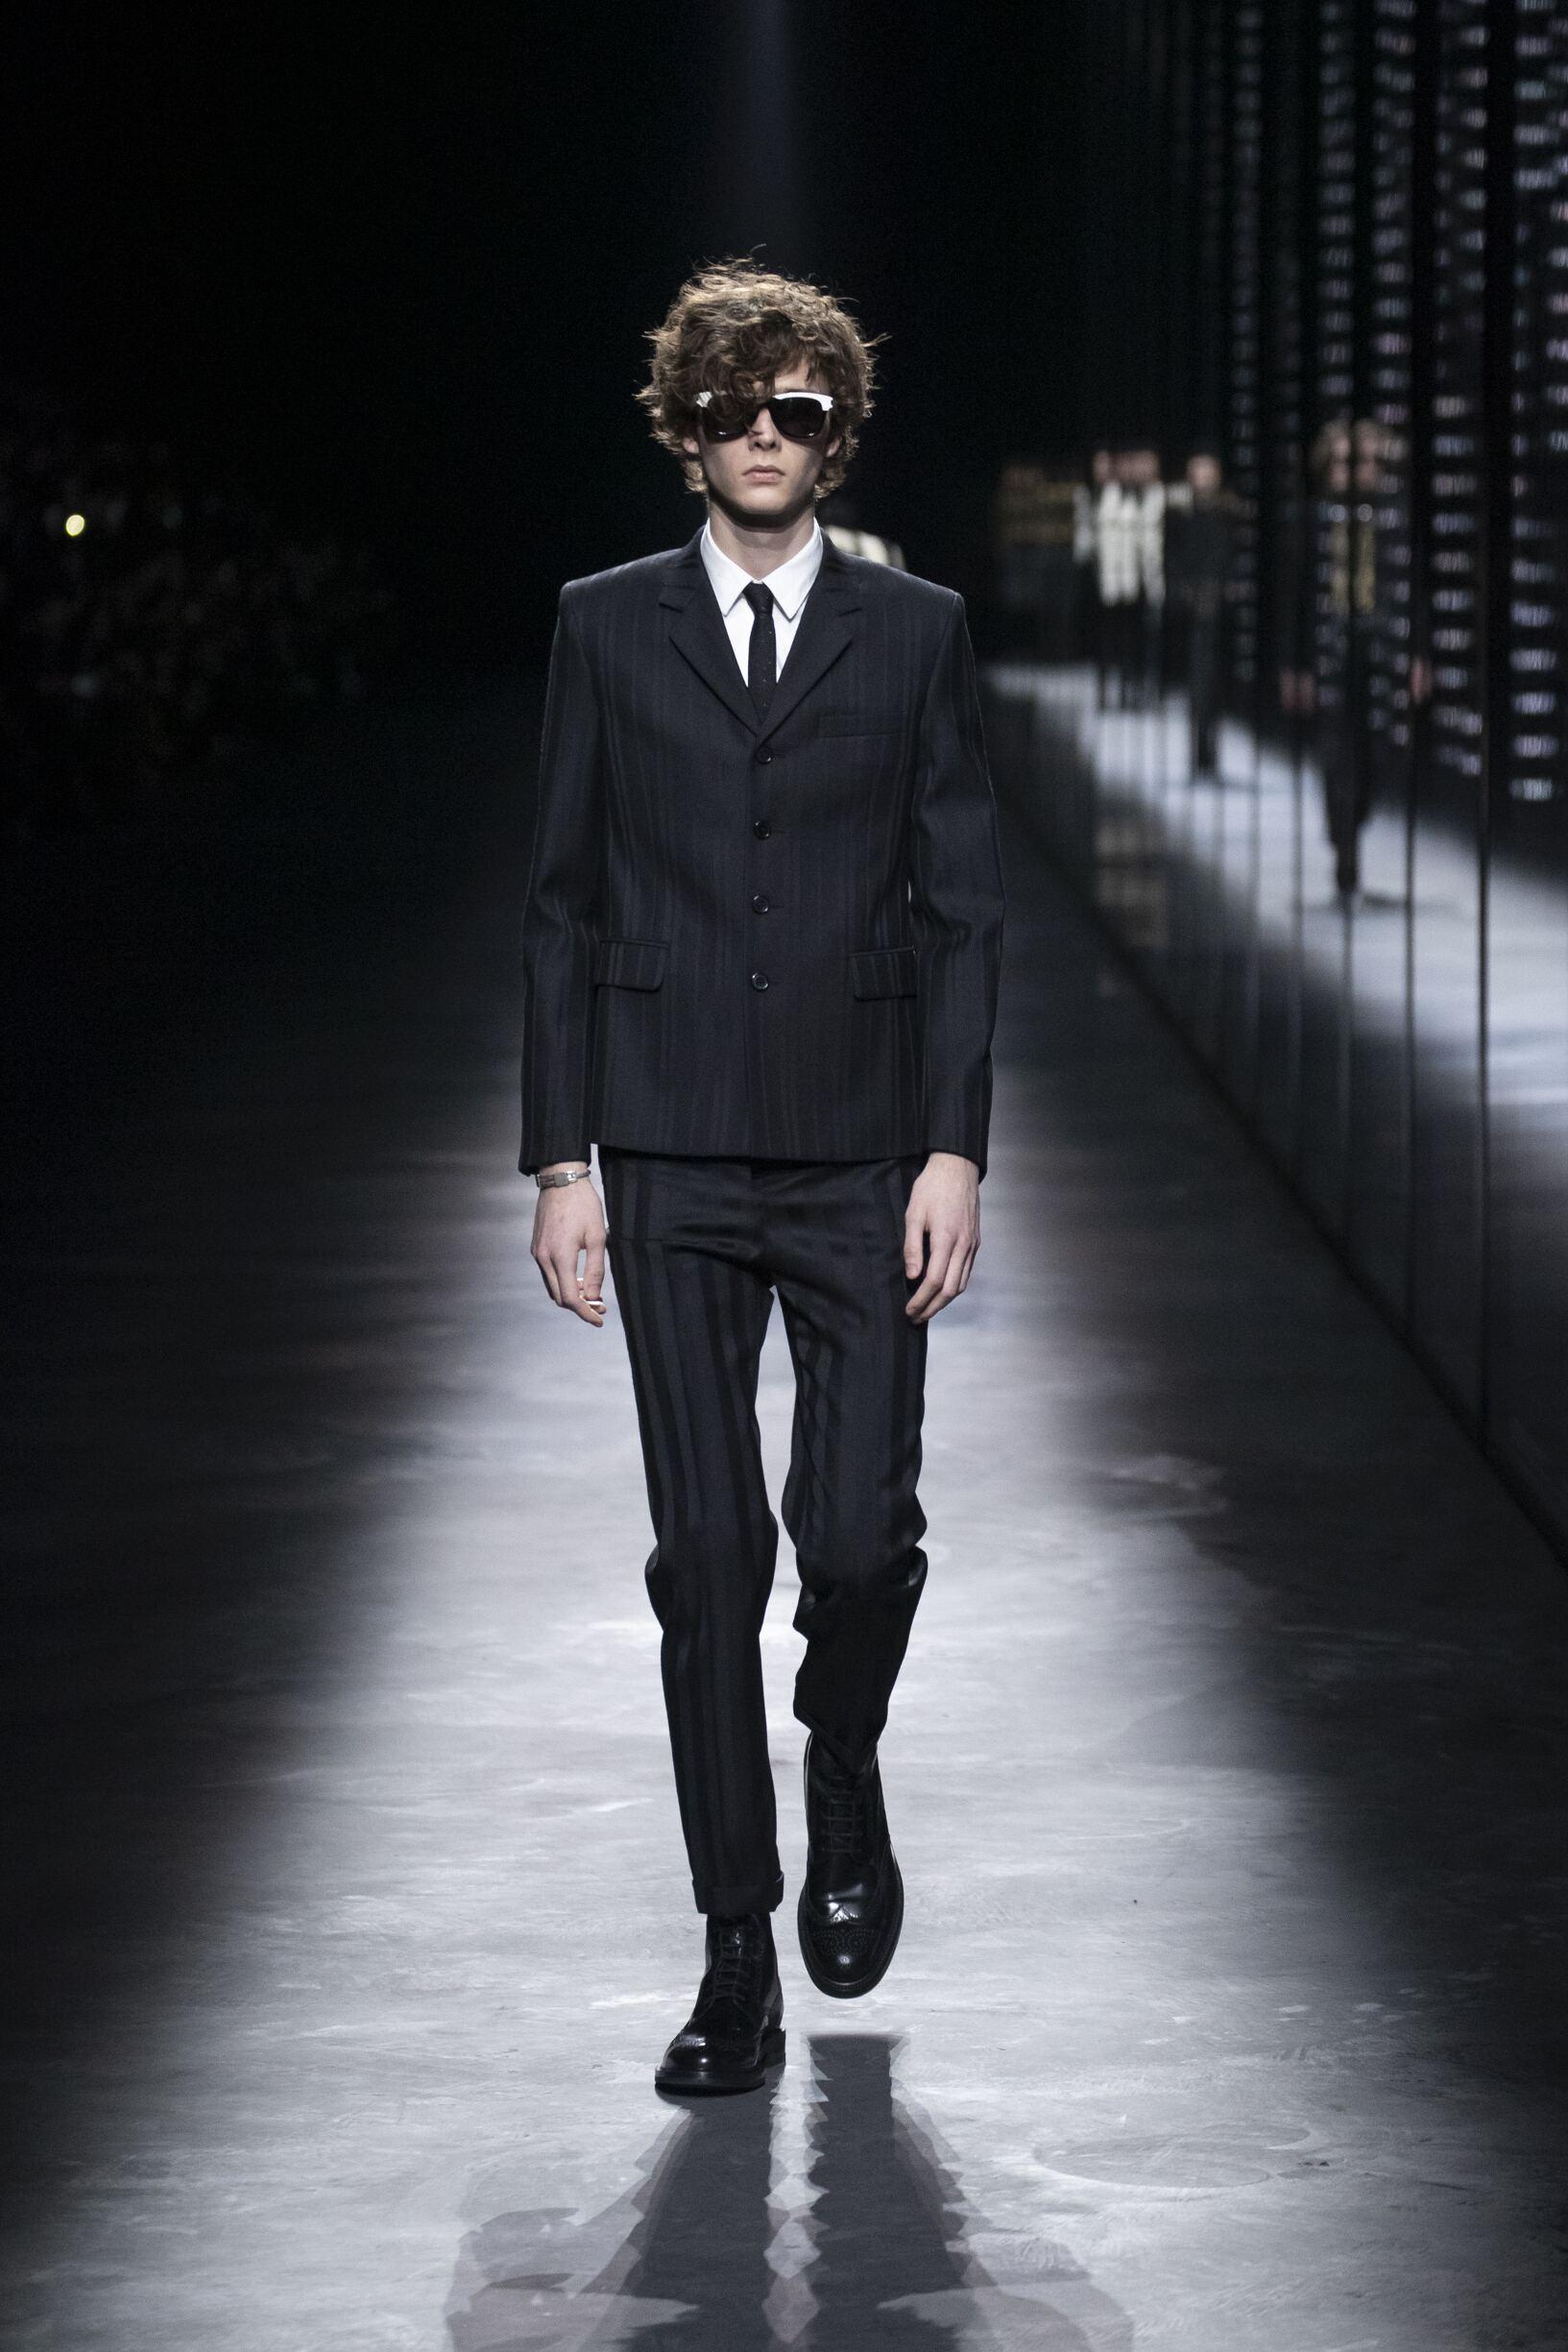 Man Fall Winter Fashion Trends 2019 Saint Laurent